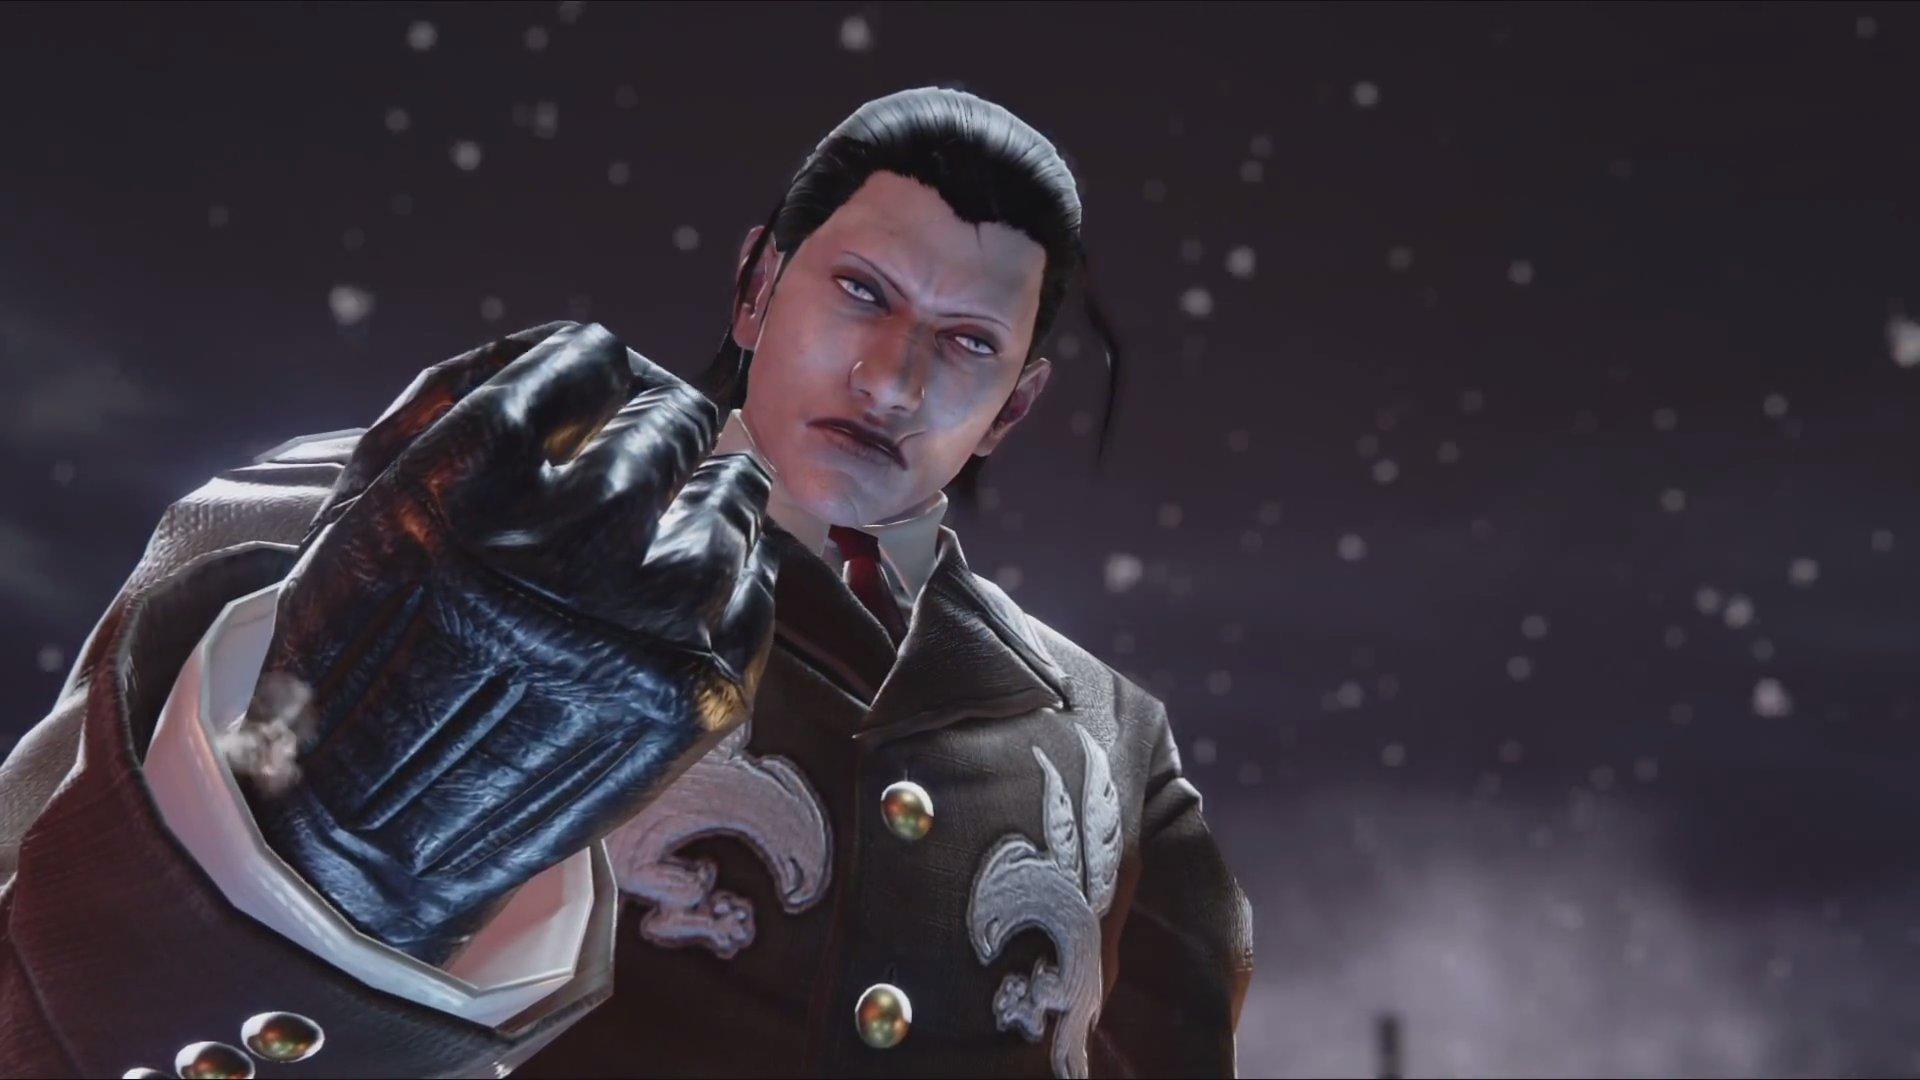 Nobi Wins Inaugural Tekken 7 King Of The Iron Fist Tournament